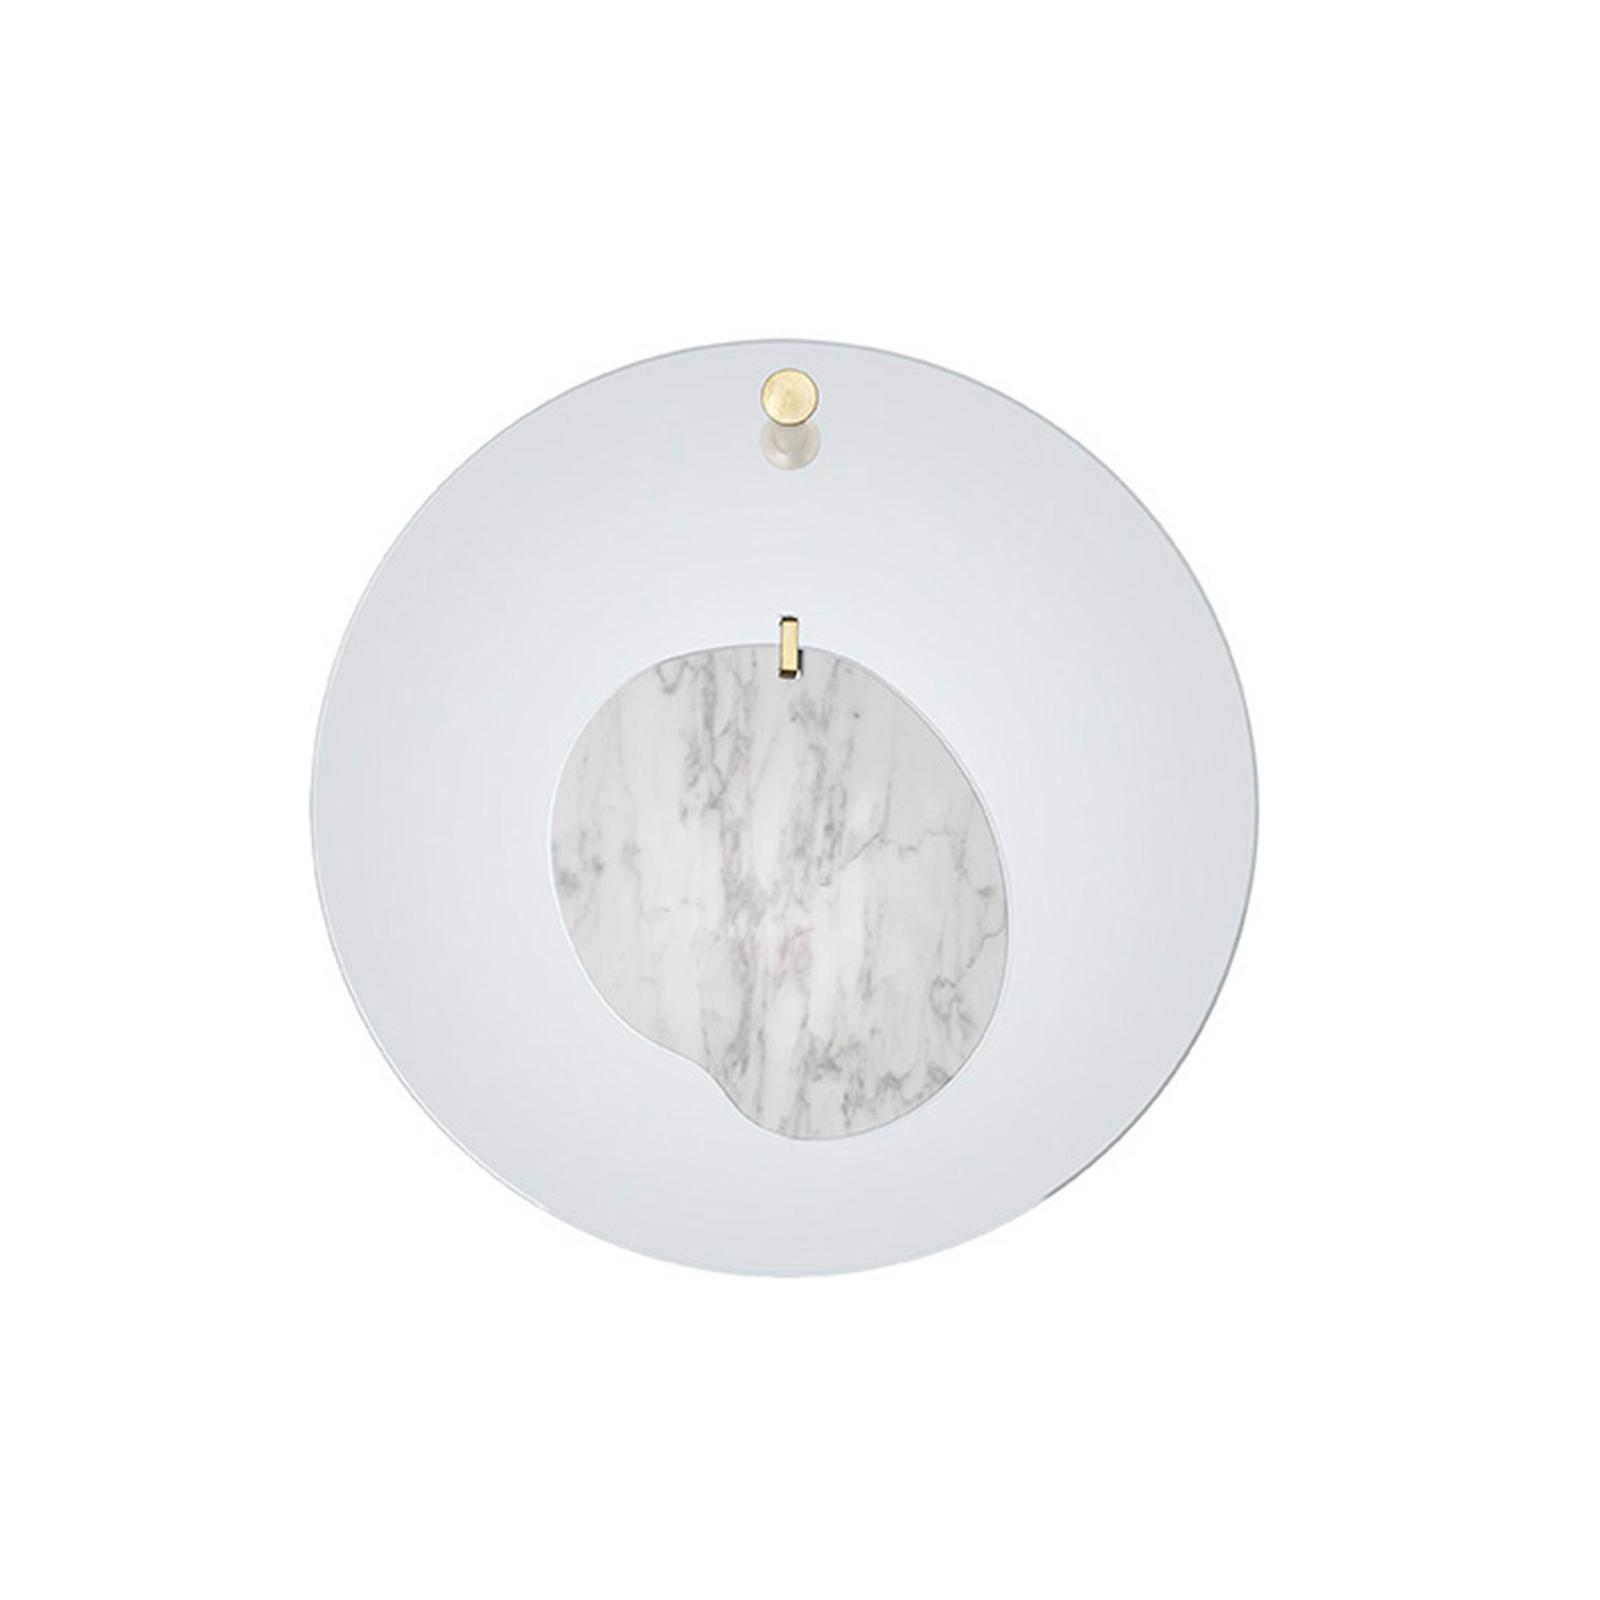 Foscarini Gioia LED-Wandleuchte, Ø 40cm, hellblau